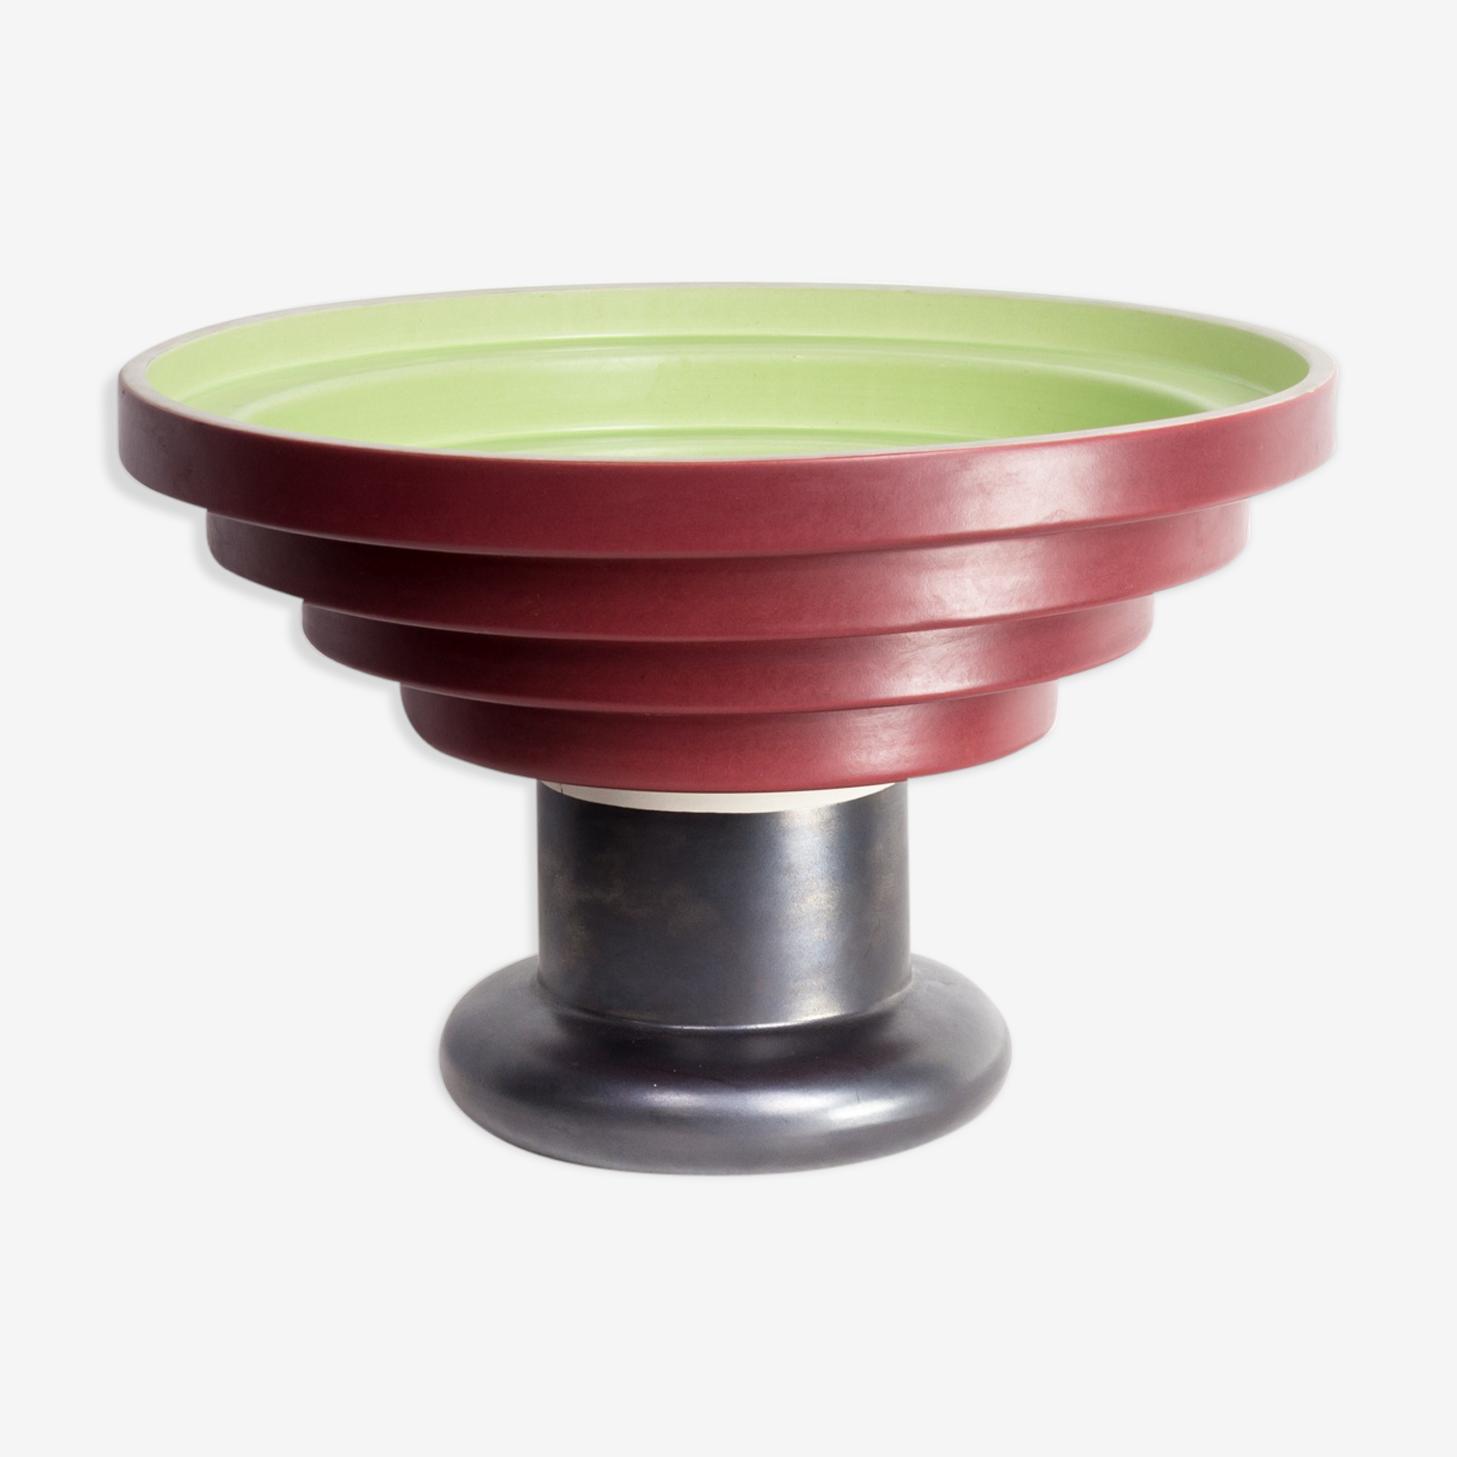 Vase Ettore Sottsass pour Bitossi Montelupo